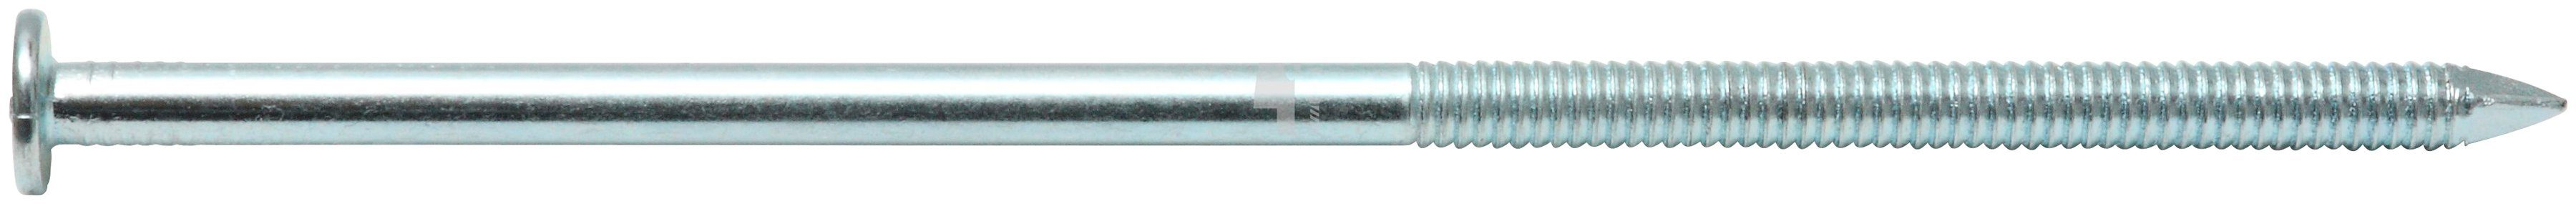 RAMSES Nagel , Sparrennägel 6 x 230 mm Stahl, 100 Stk.